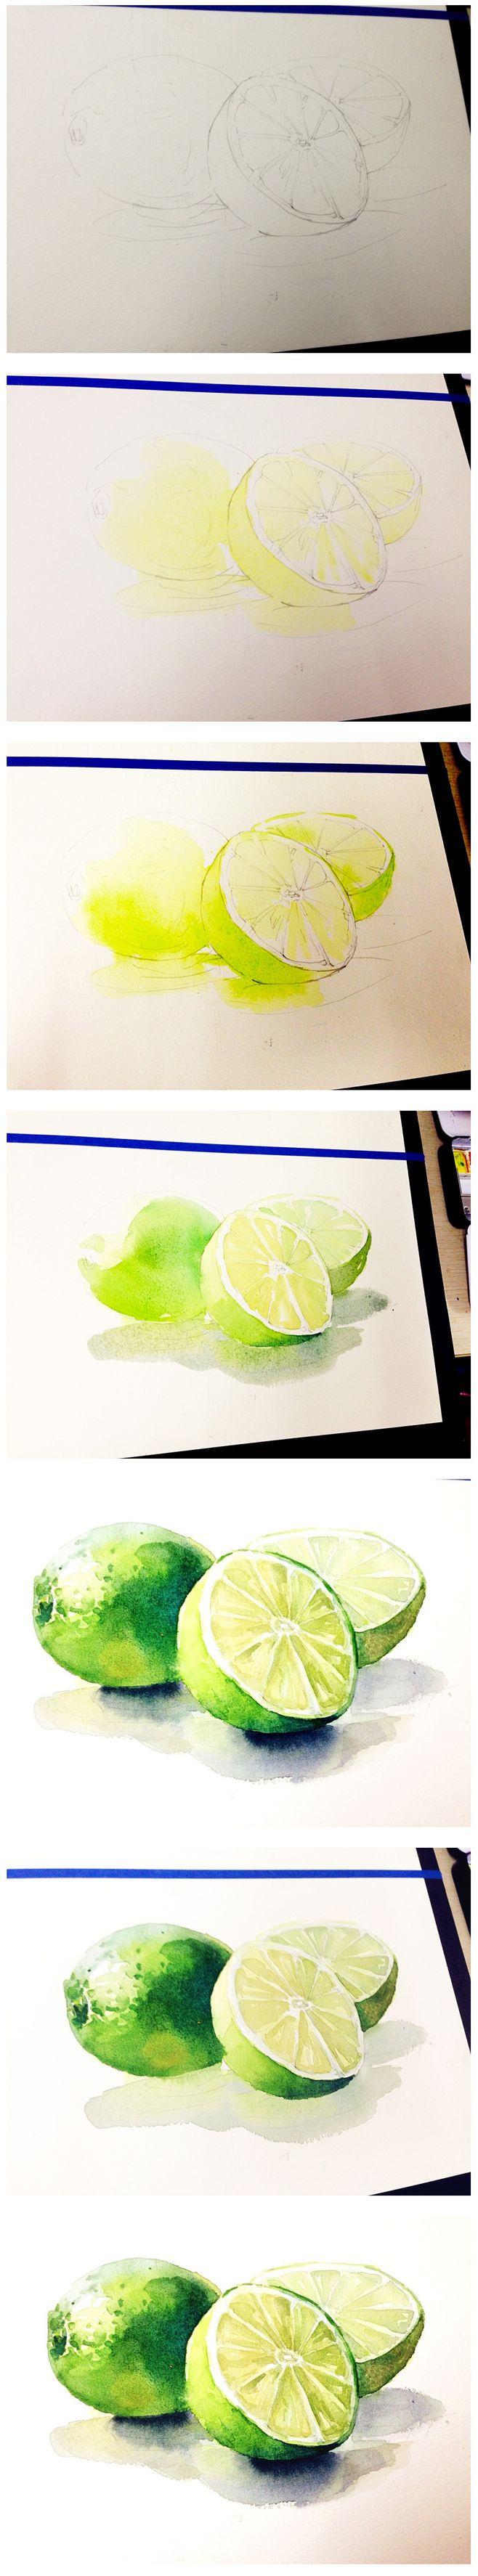 124 best Malen images on Pinterest | Water colors, Watercolor ...